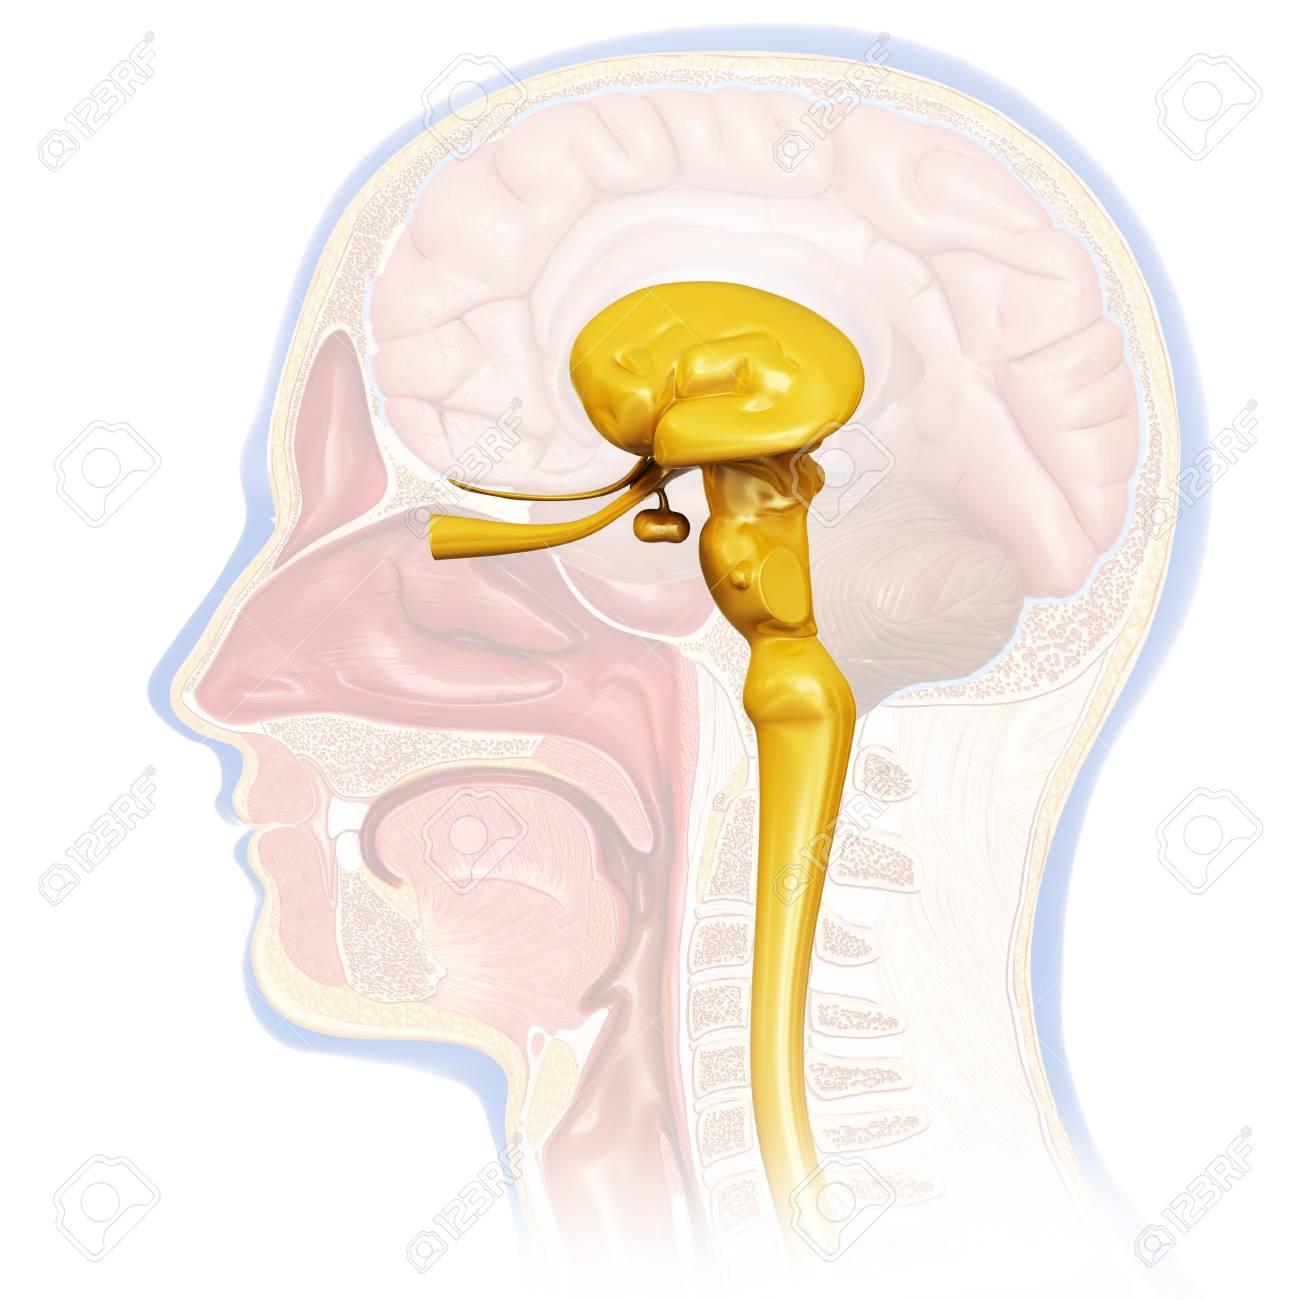 Human Midbrain Anatomy, Illustration Stock Photo, Picture And ...